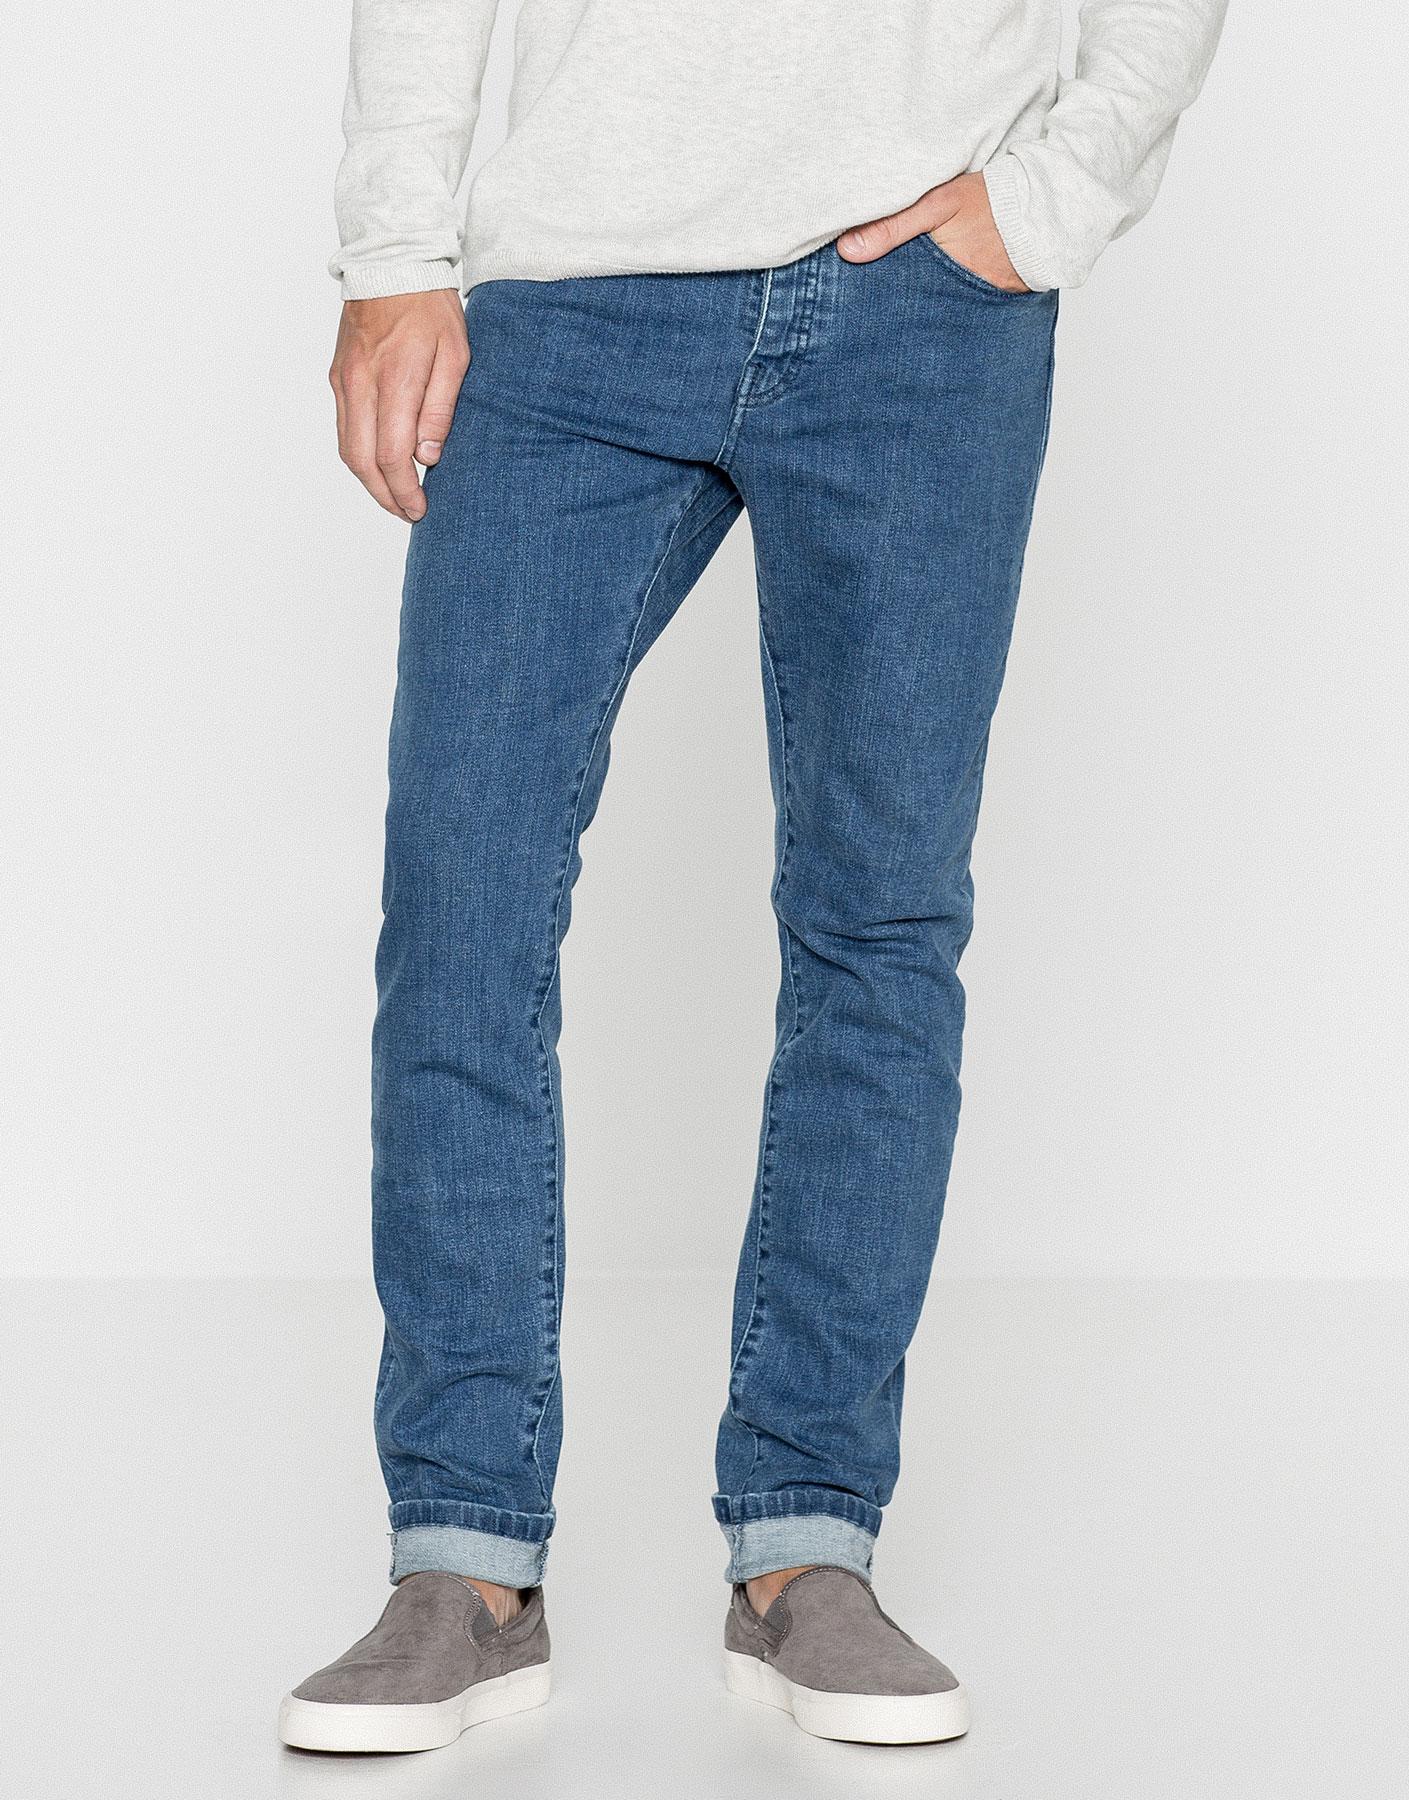 Slim comfort jeans